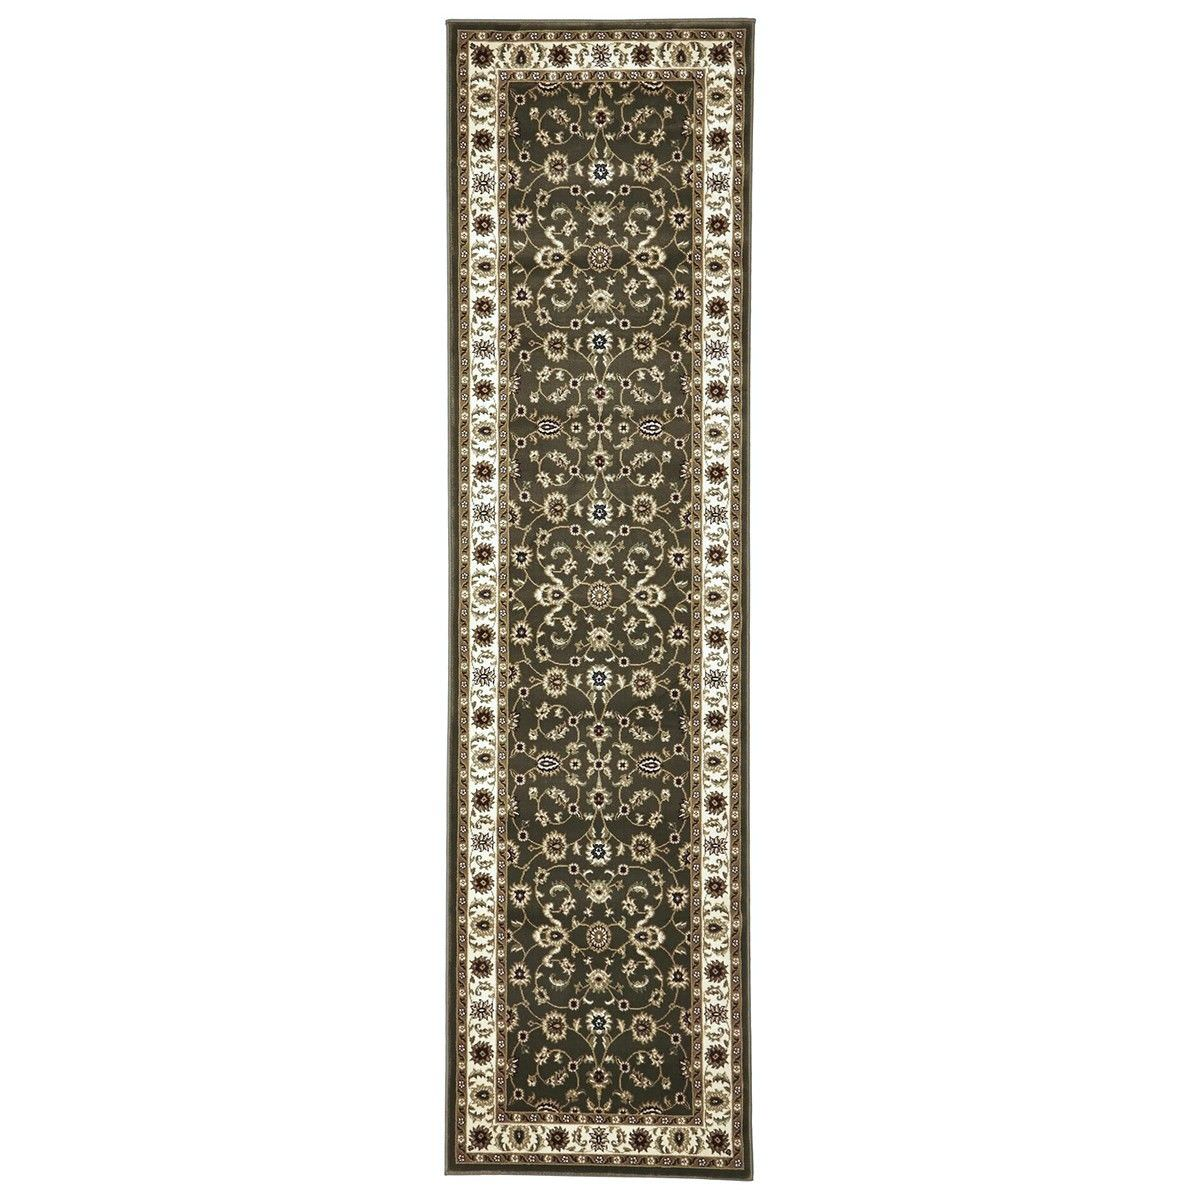 Sydney Classic Turkish Made Oriental Runner Rug, 300x80cm, Green / Ivory